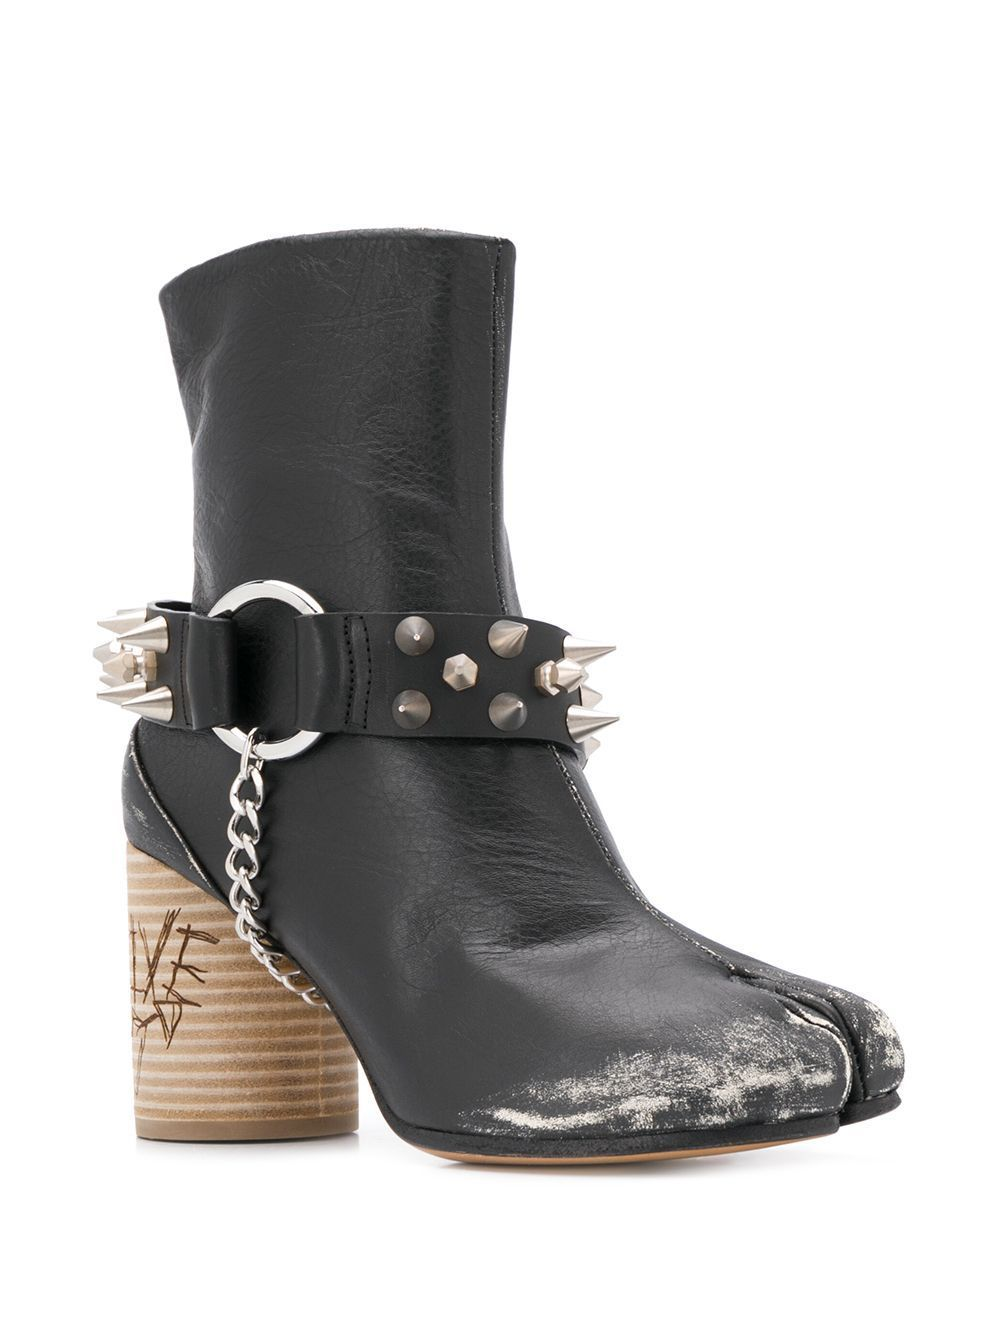 MAISON MARGIELA WOMEN'S S58WU0284P1959T8013 BLACK LEATHER ANKLE BOOTS